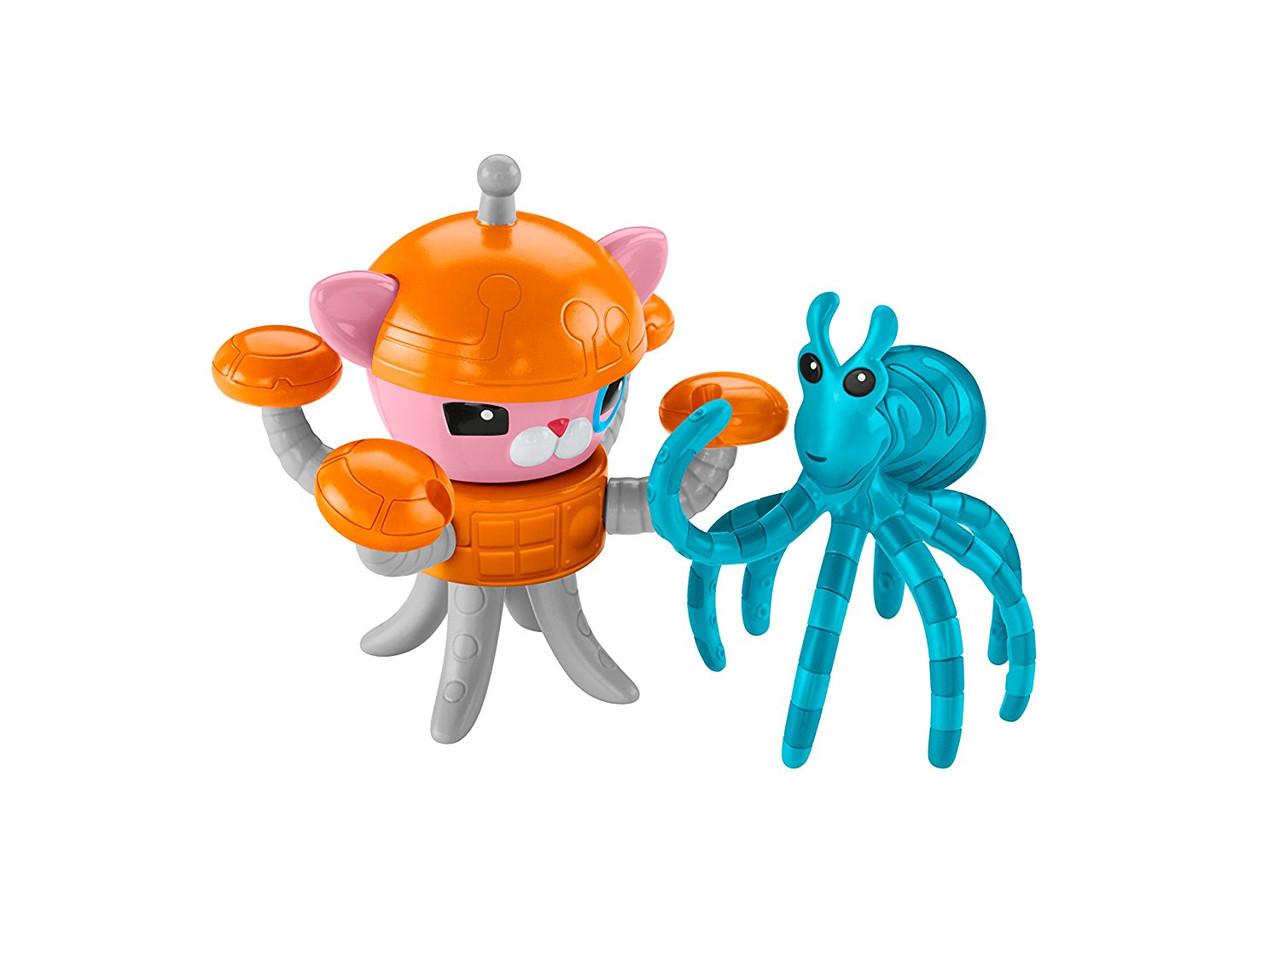 Игрушка Октонавты Инклинг Fisher-Price Octonauts Inkling & the Mimic Octopus, фото 1